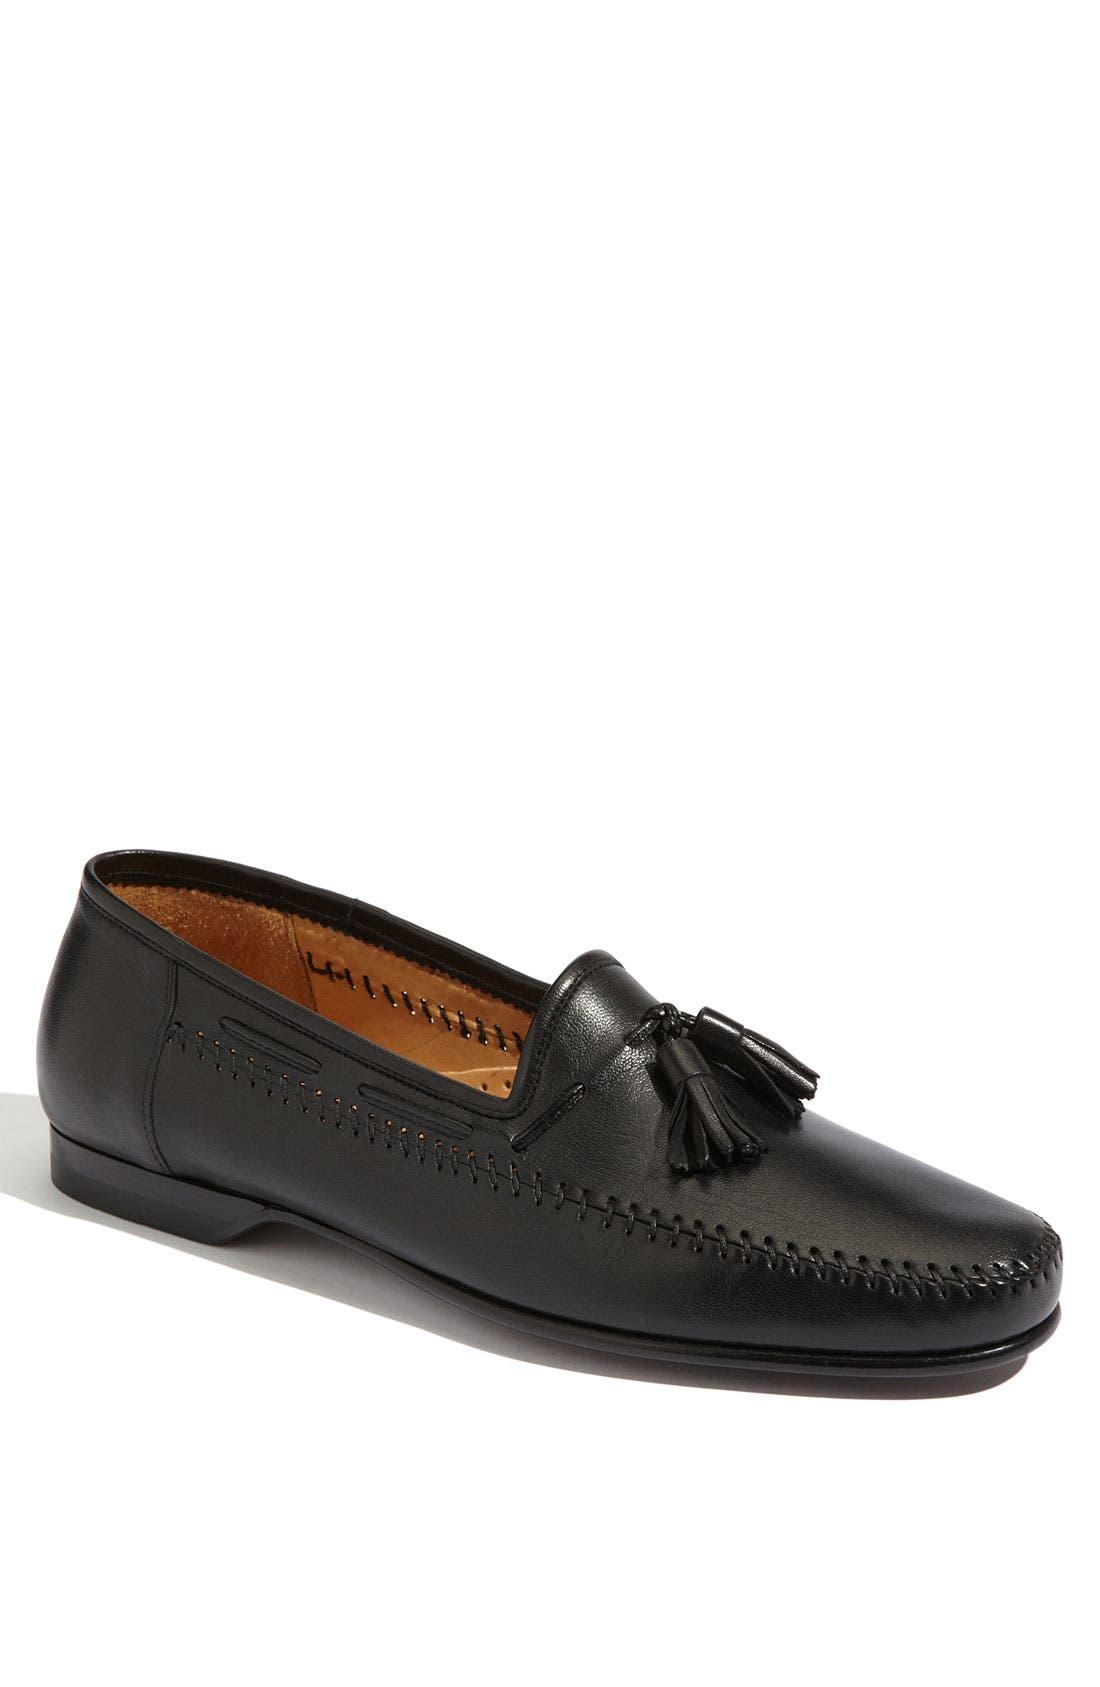 Alternate Image 1 Selected - Magnanni 'Ancona' Loafer